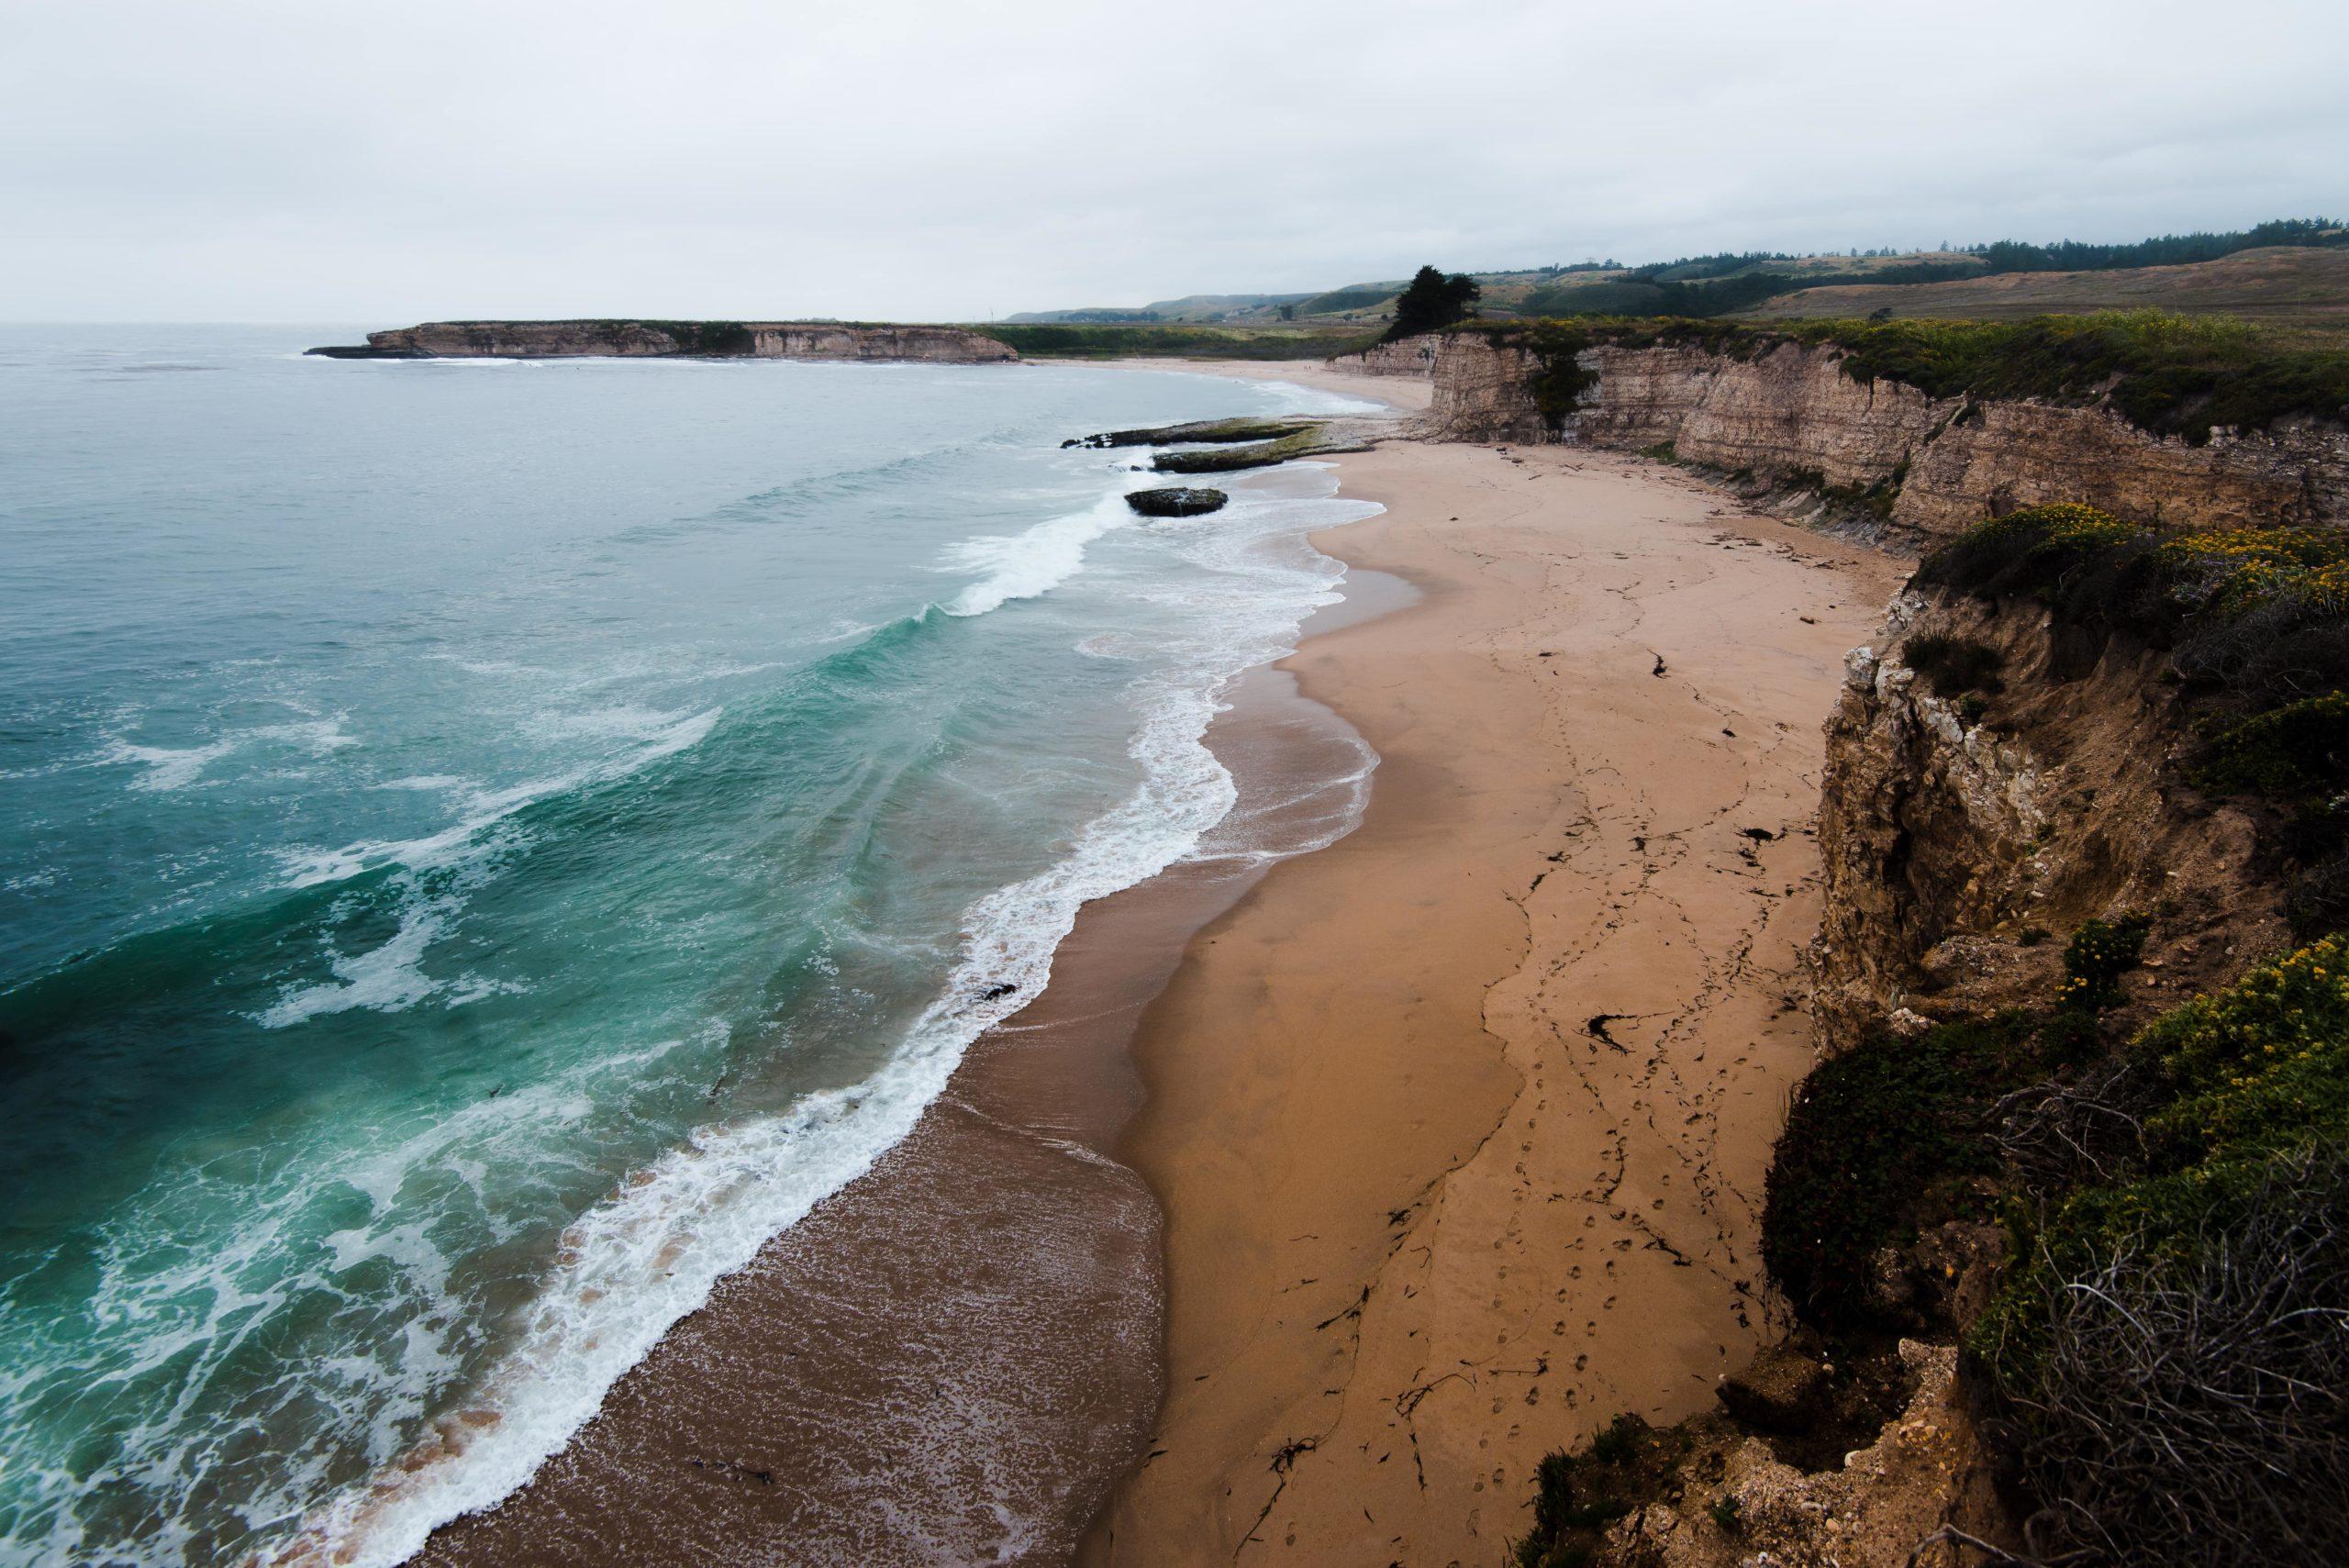 Surfing Santa Cruz - Four Mile